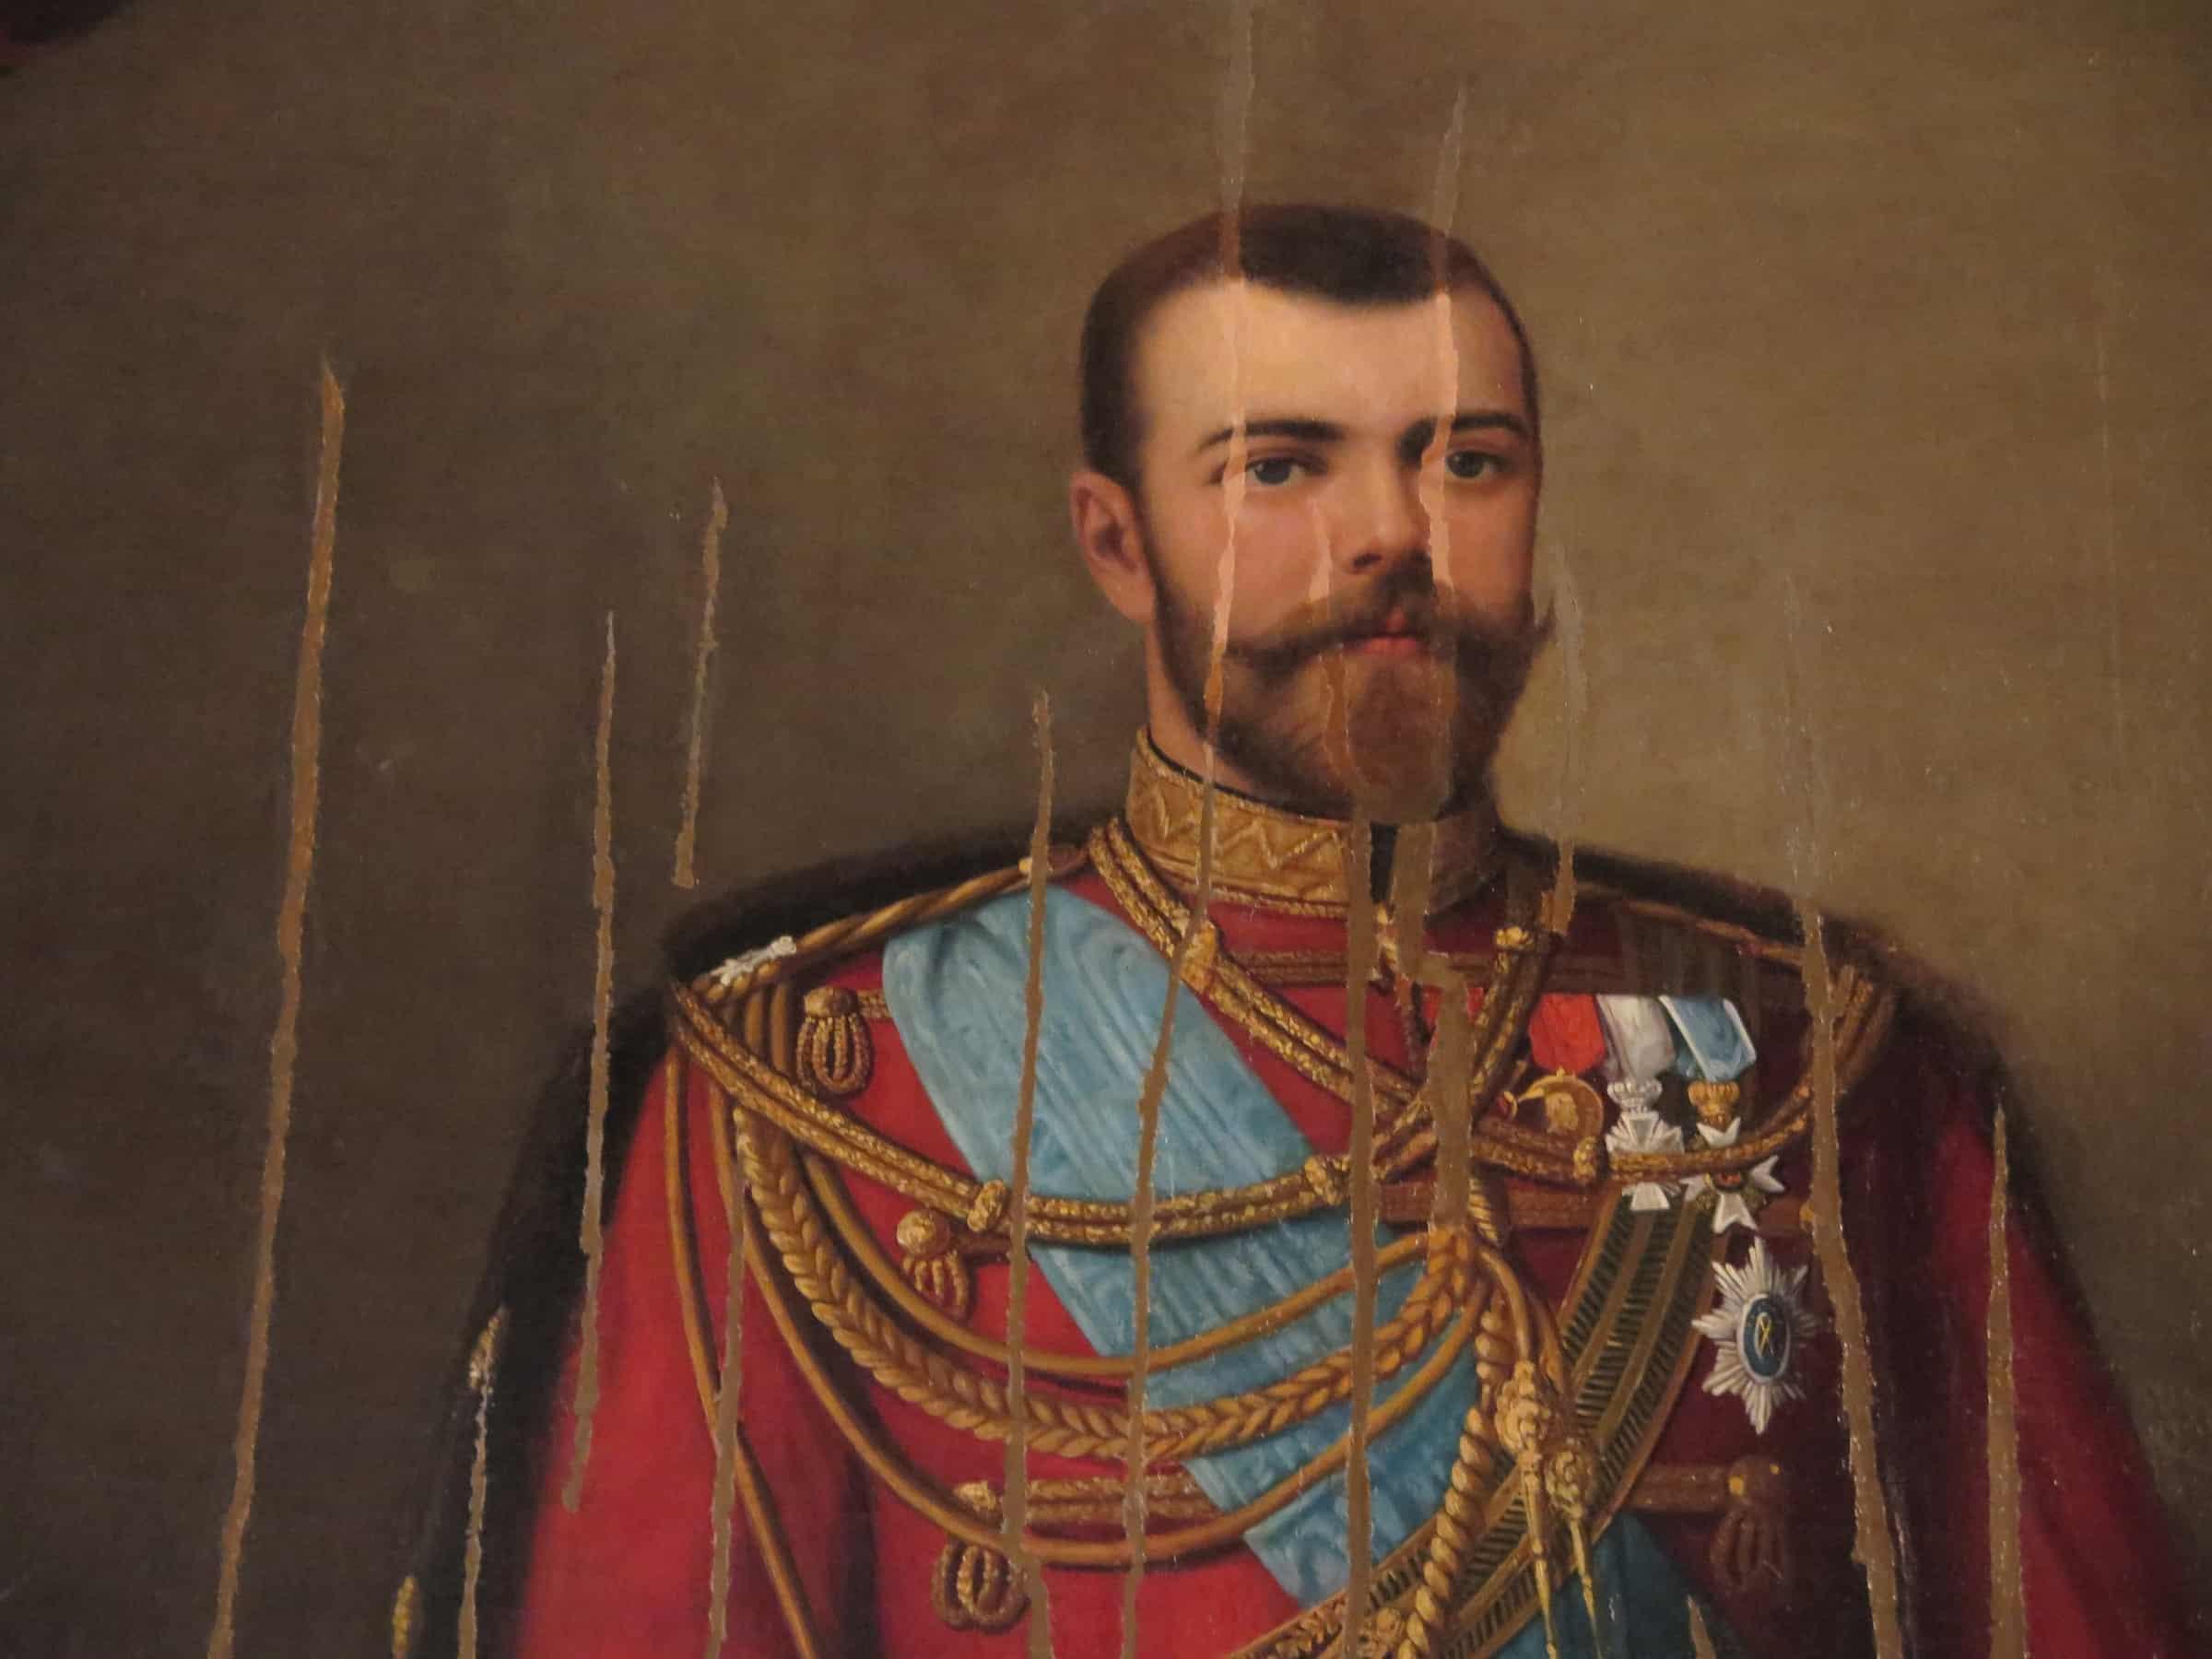 Portrait of Tsar Nicholas II slashed after the 1917 Revolution